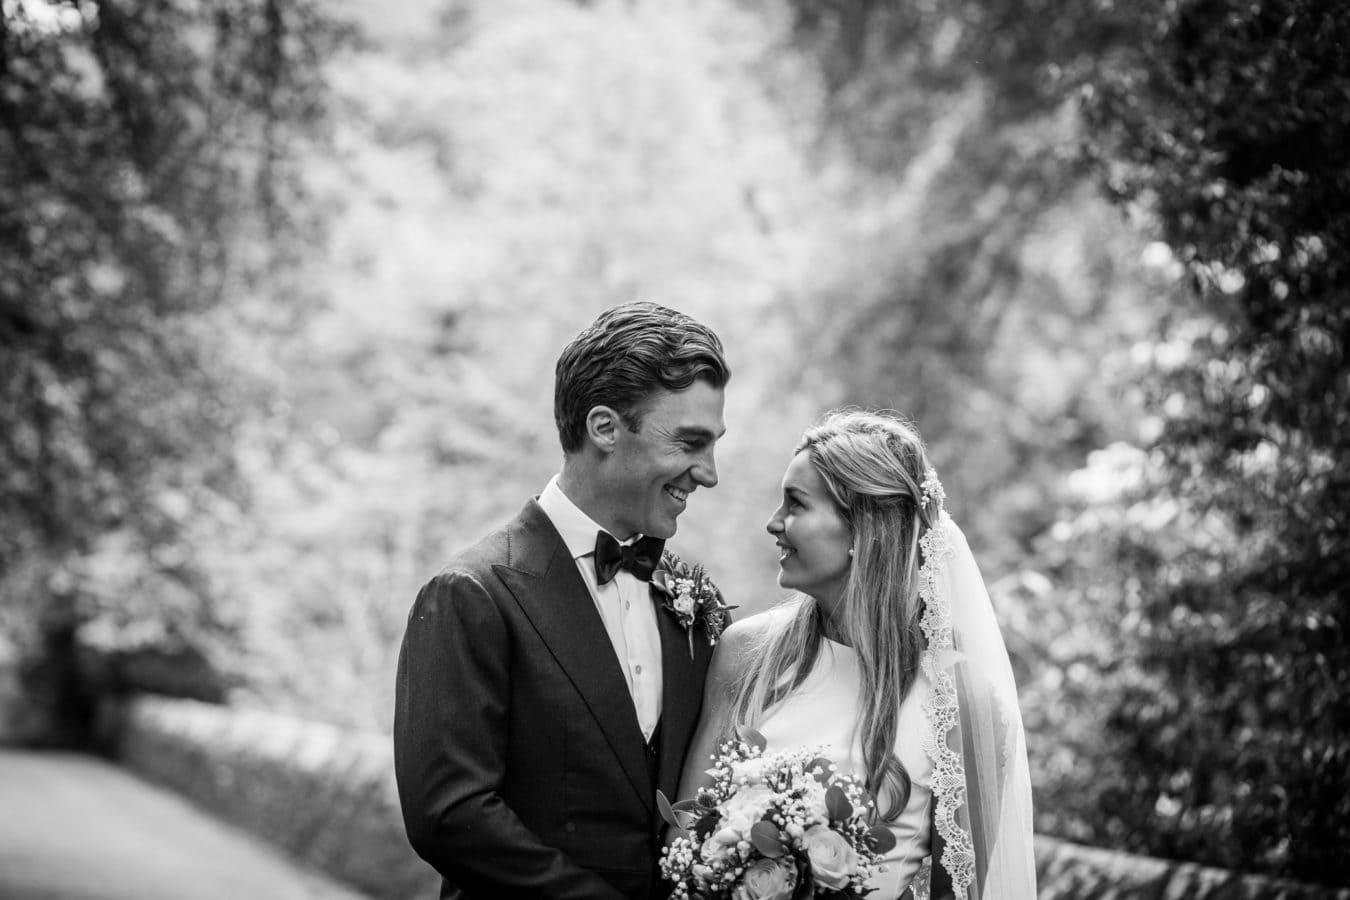 scottish-wedding-photography-nadine-boyd-black-white-bride-groom